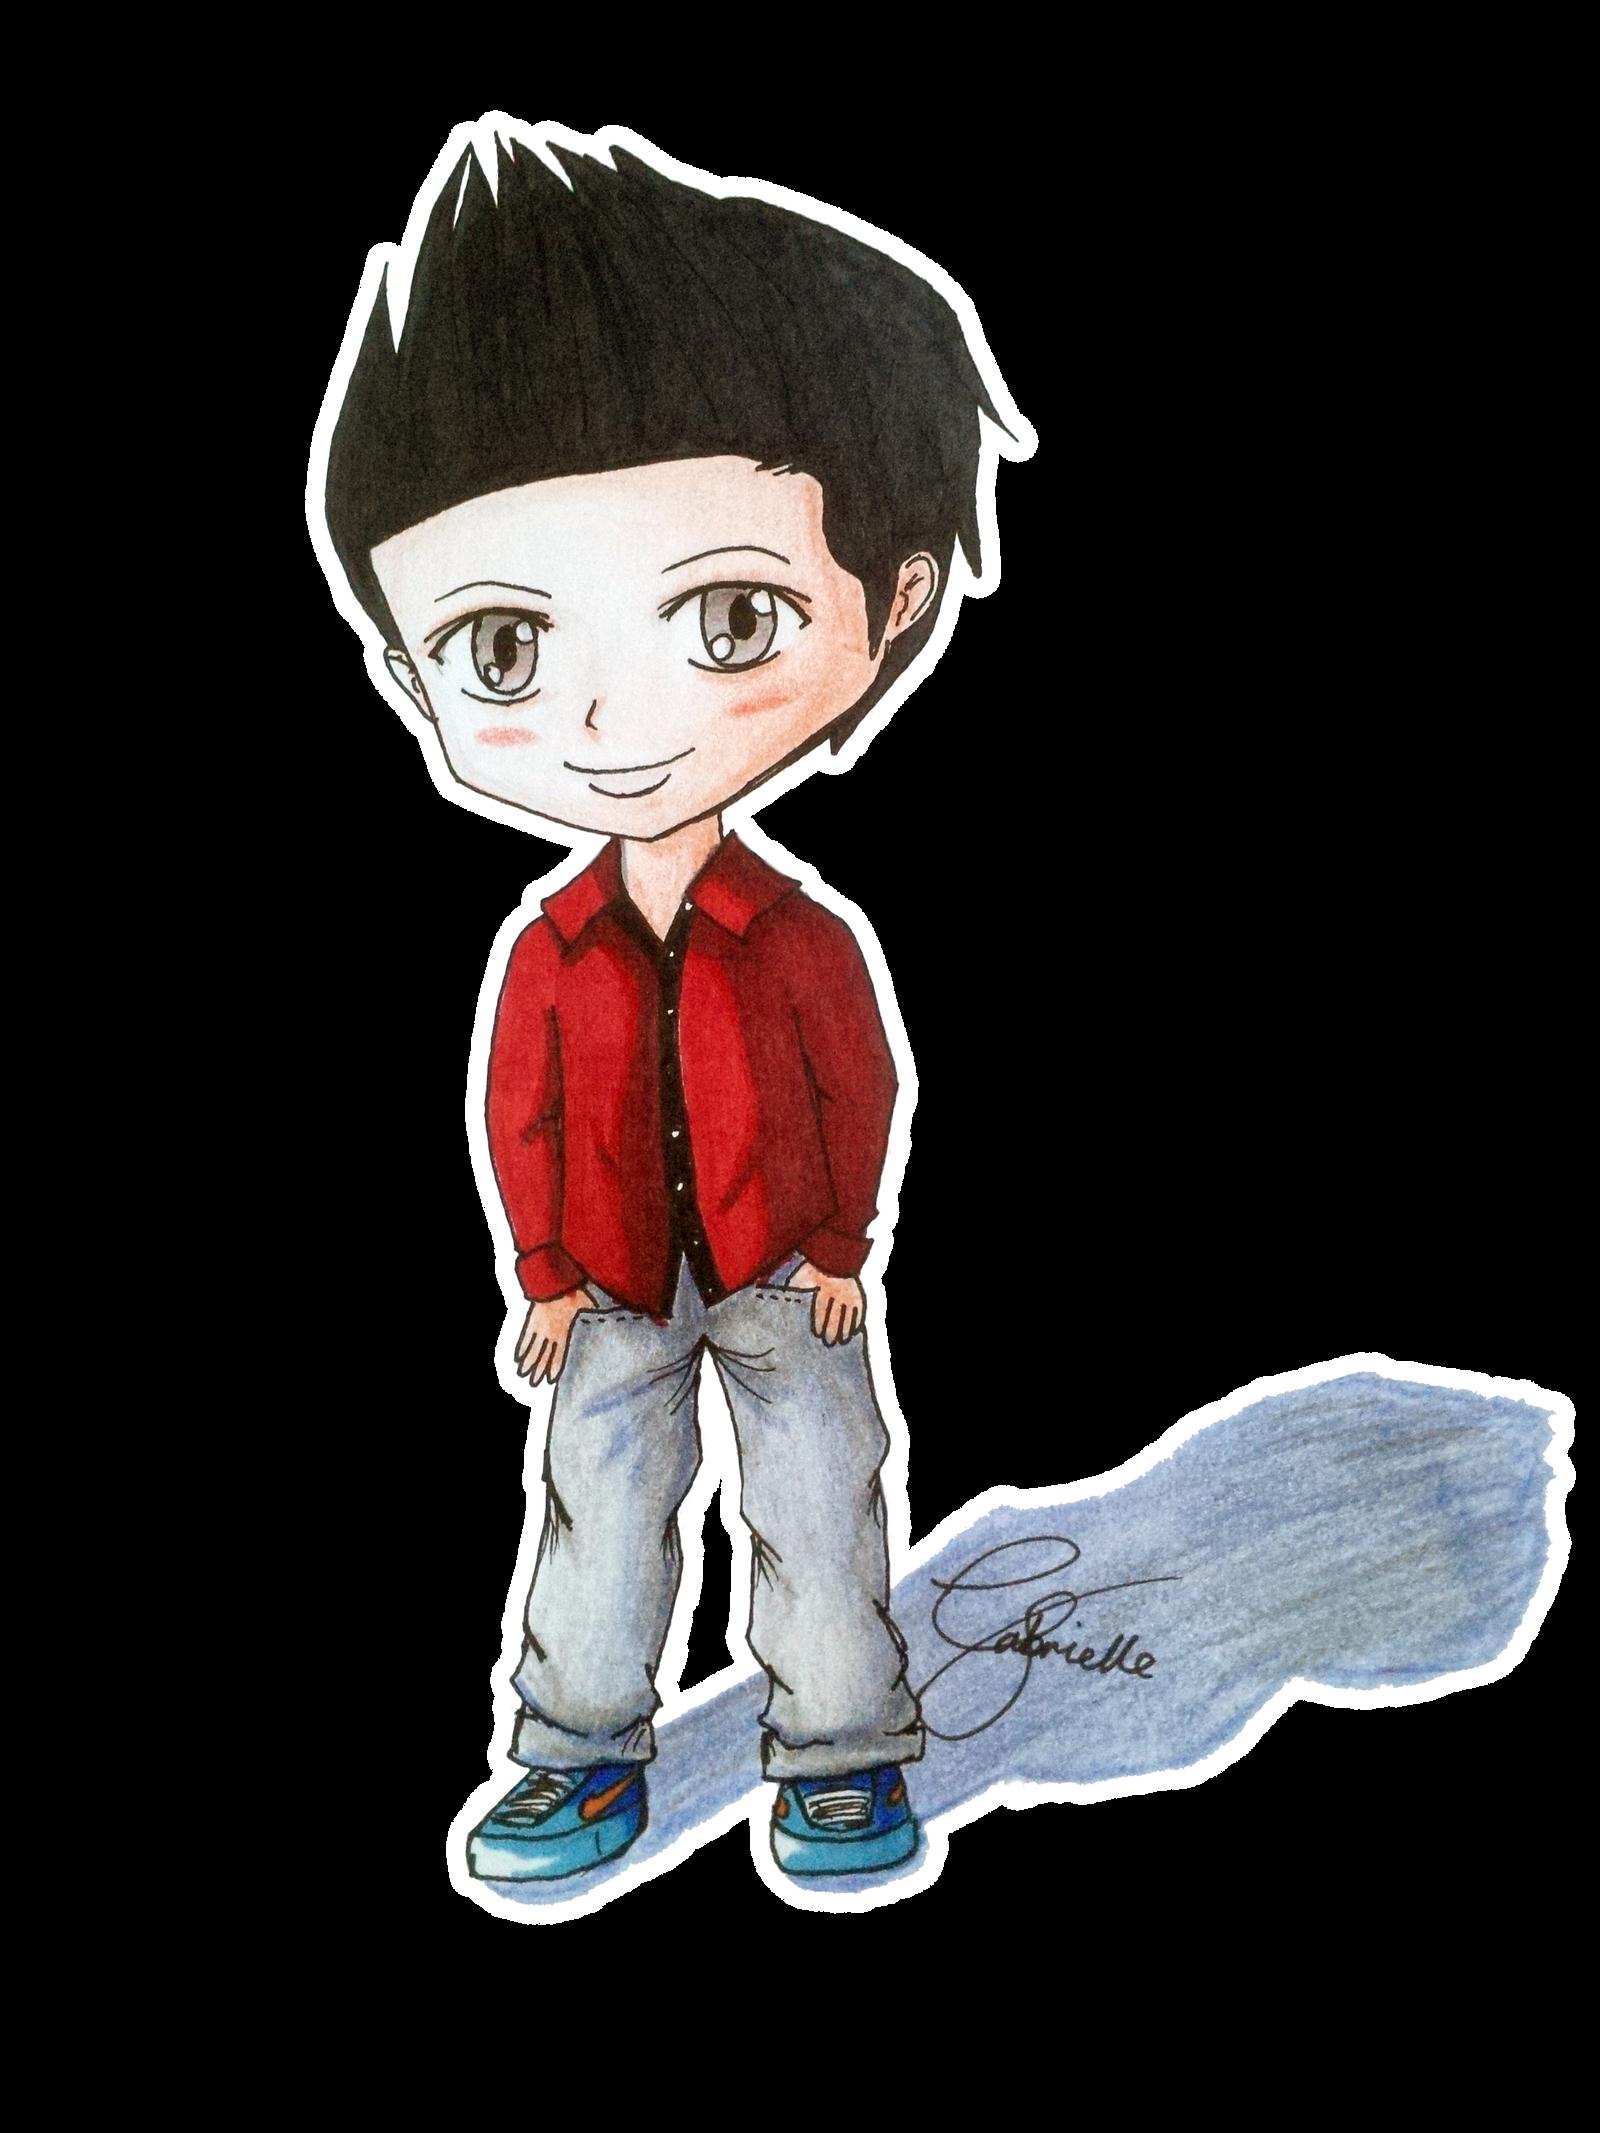 Chibi Boy By Gabbydong On Deviantart How To Draw A Chibi Boy